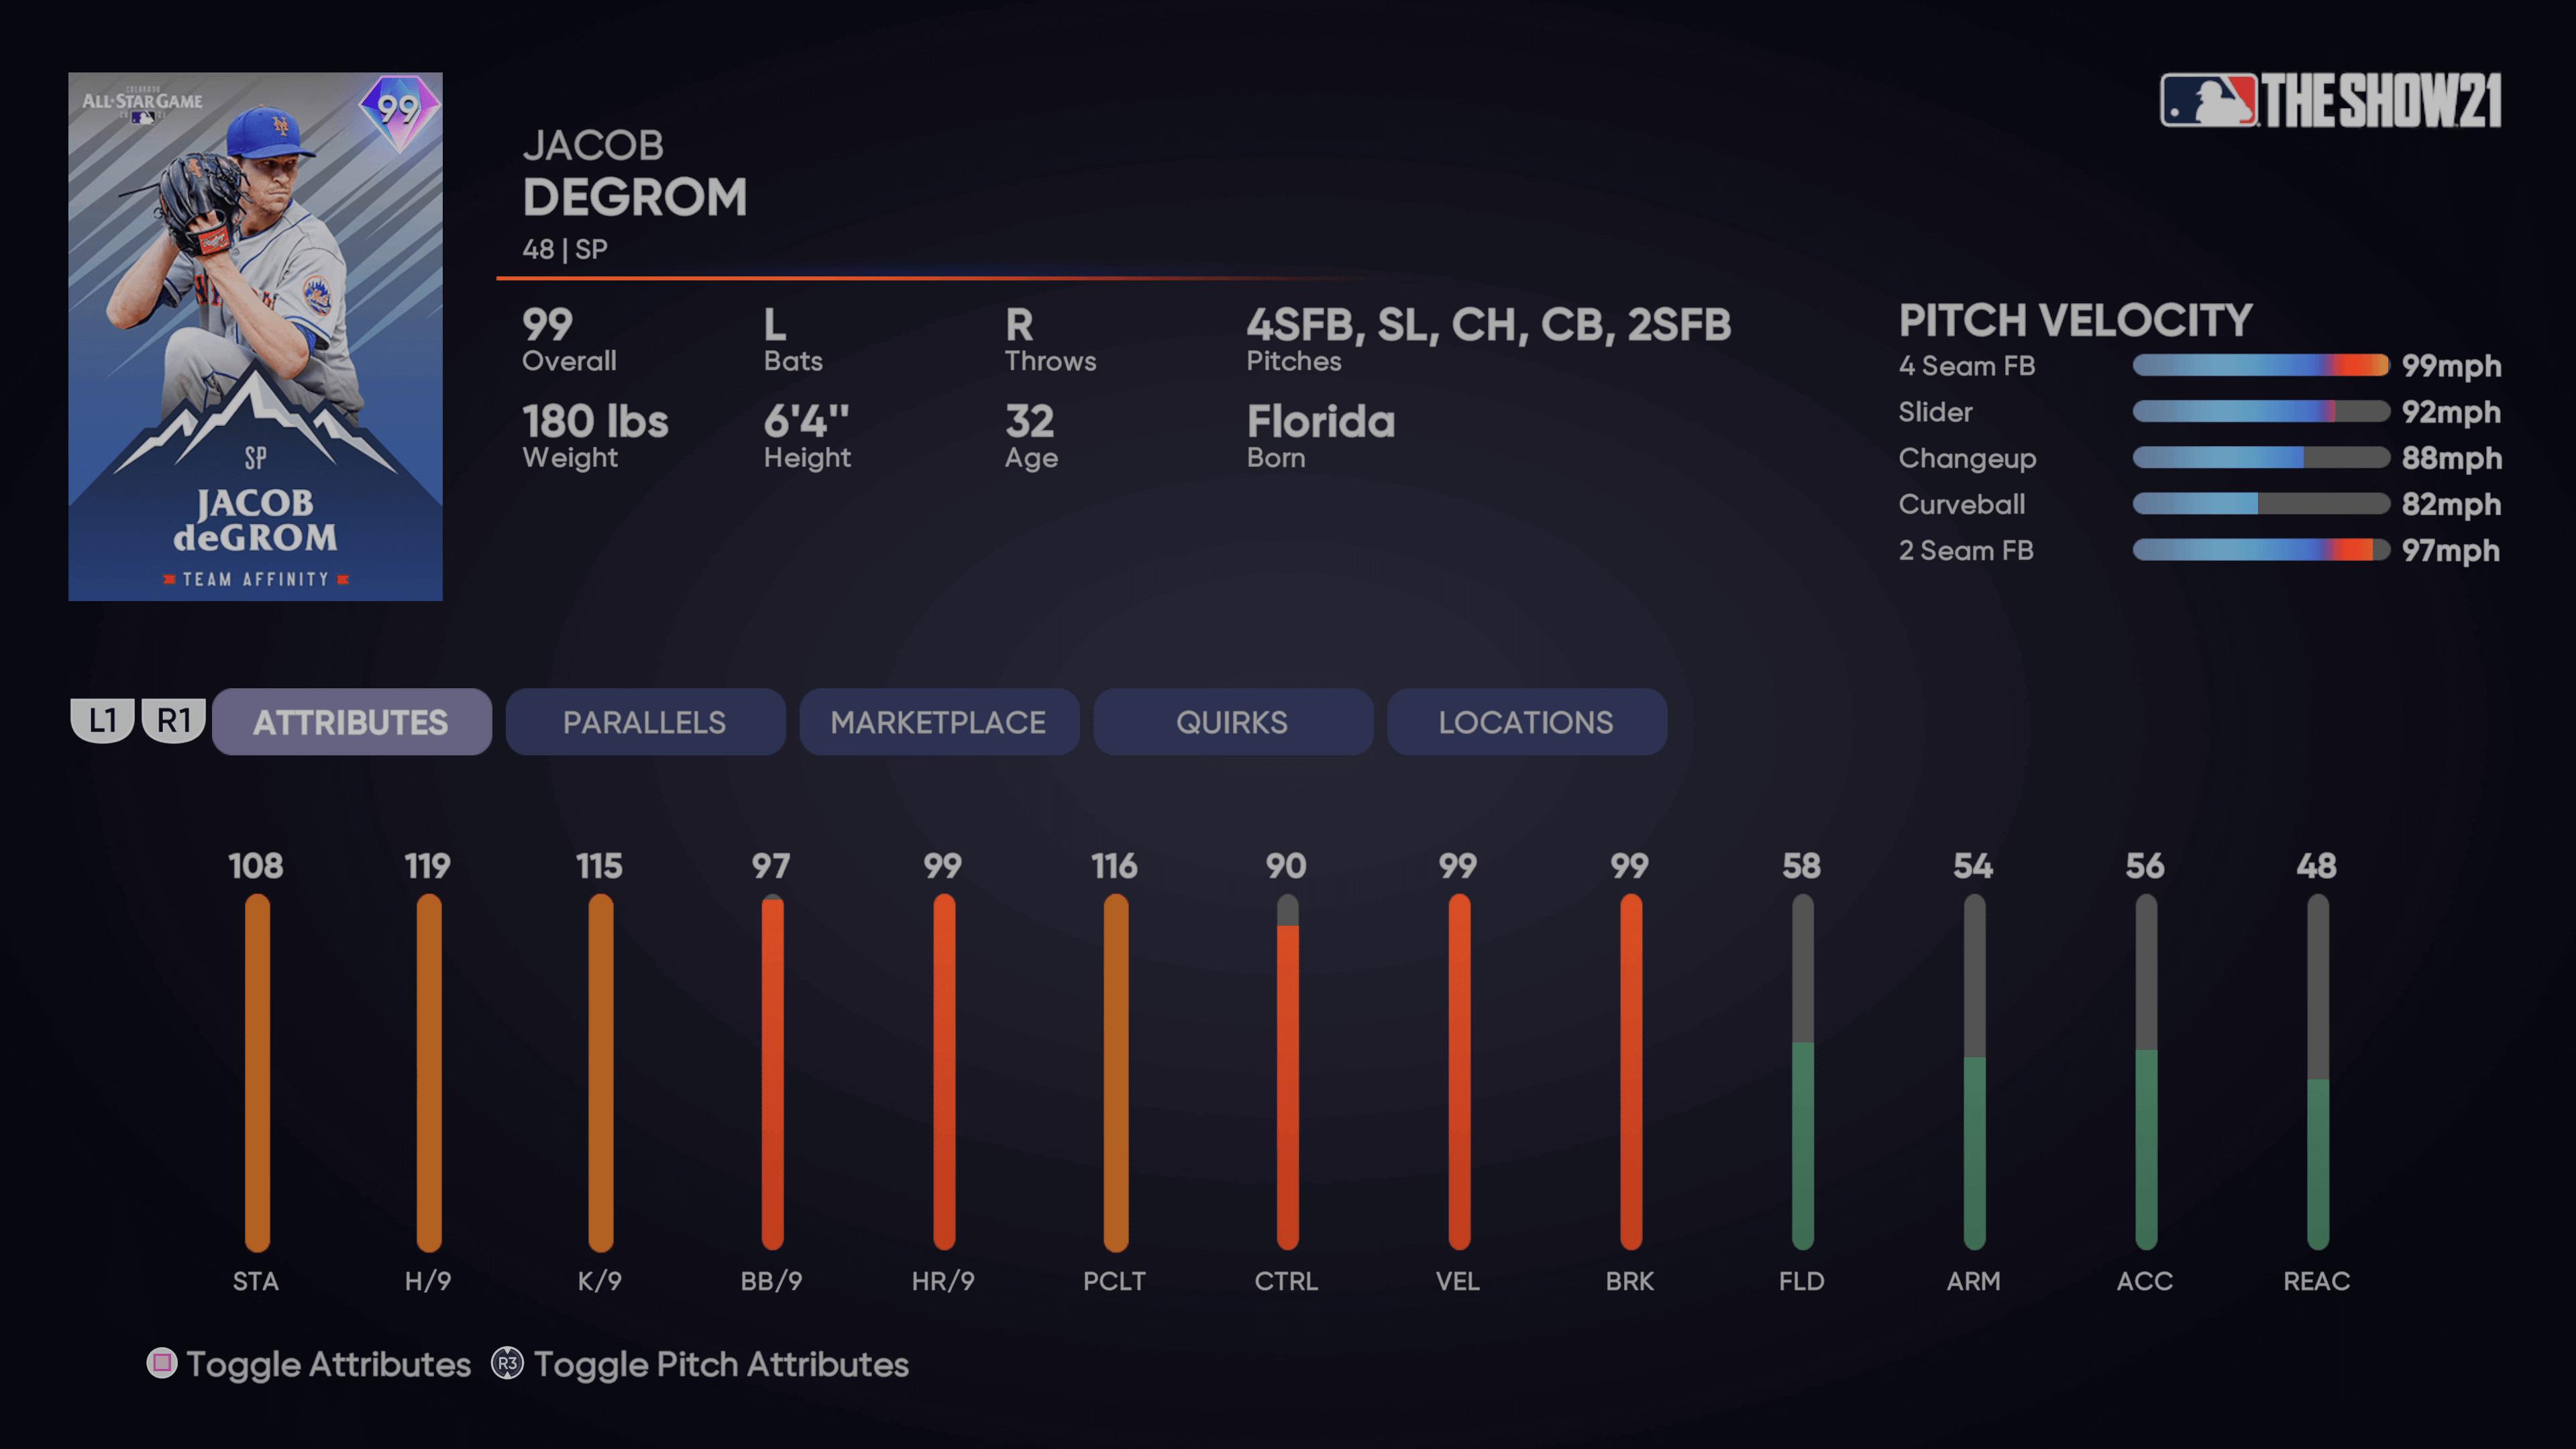 MLB The Show 21 - Team Affinity Season 3_2021-07-12_15-17-36